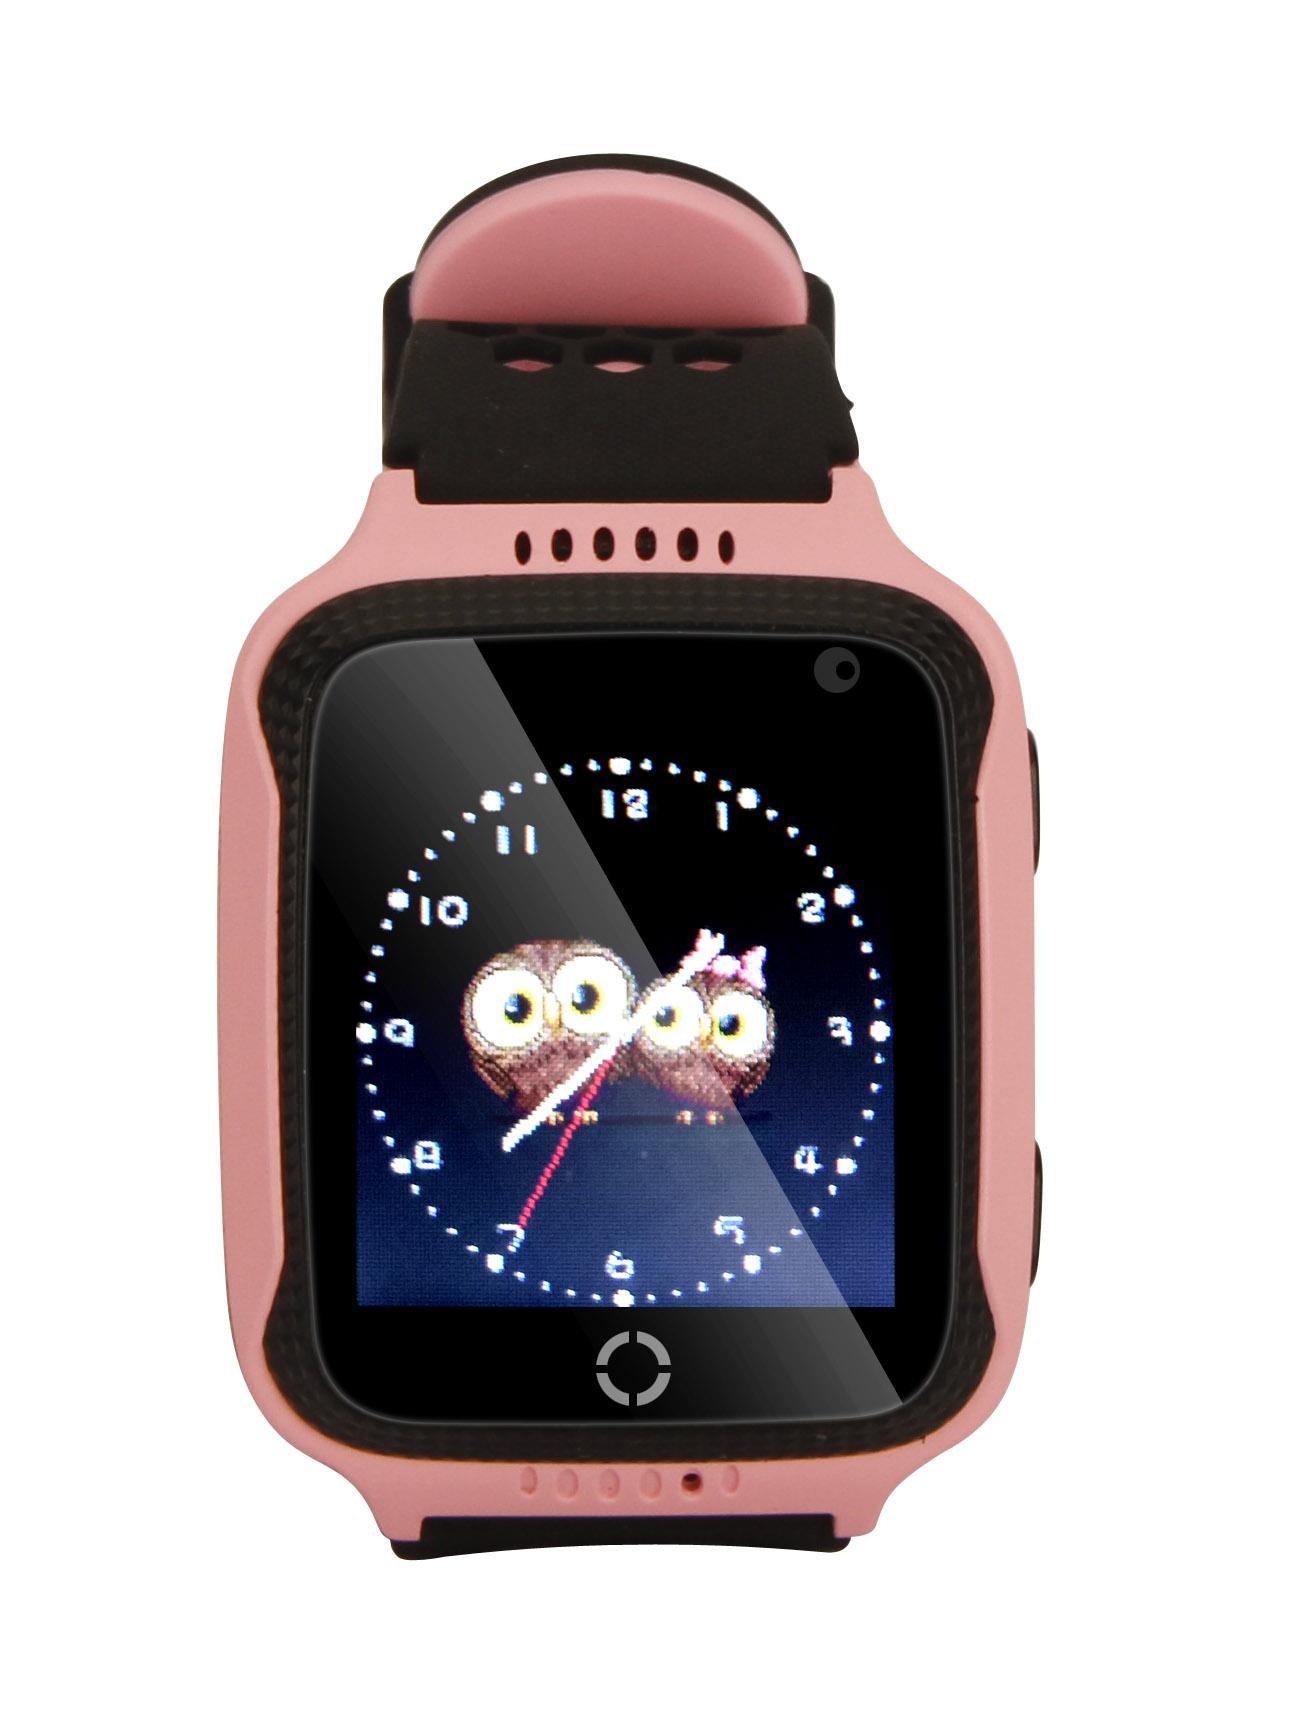 贝贝优可儿童智能GPS定位手表宝宝礼物W4 2